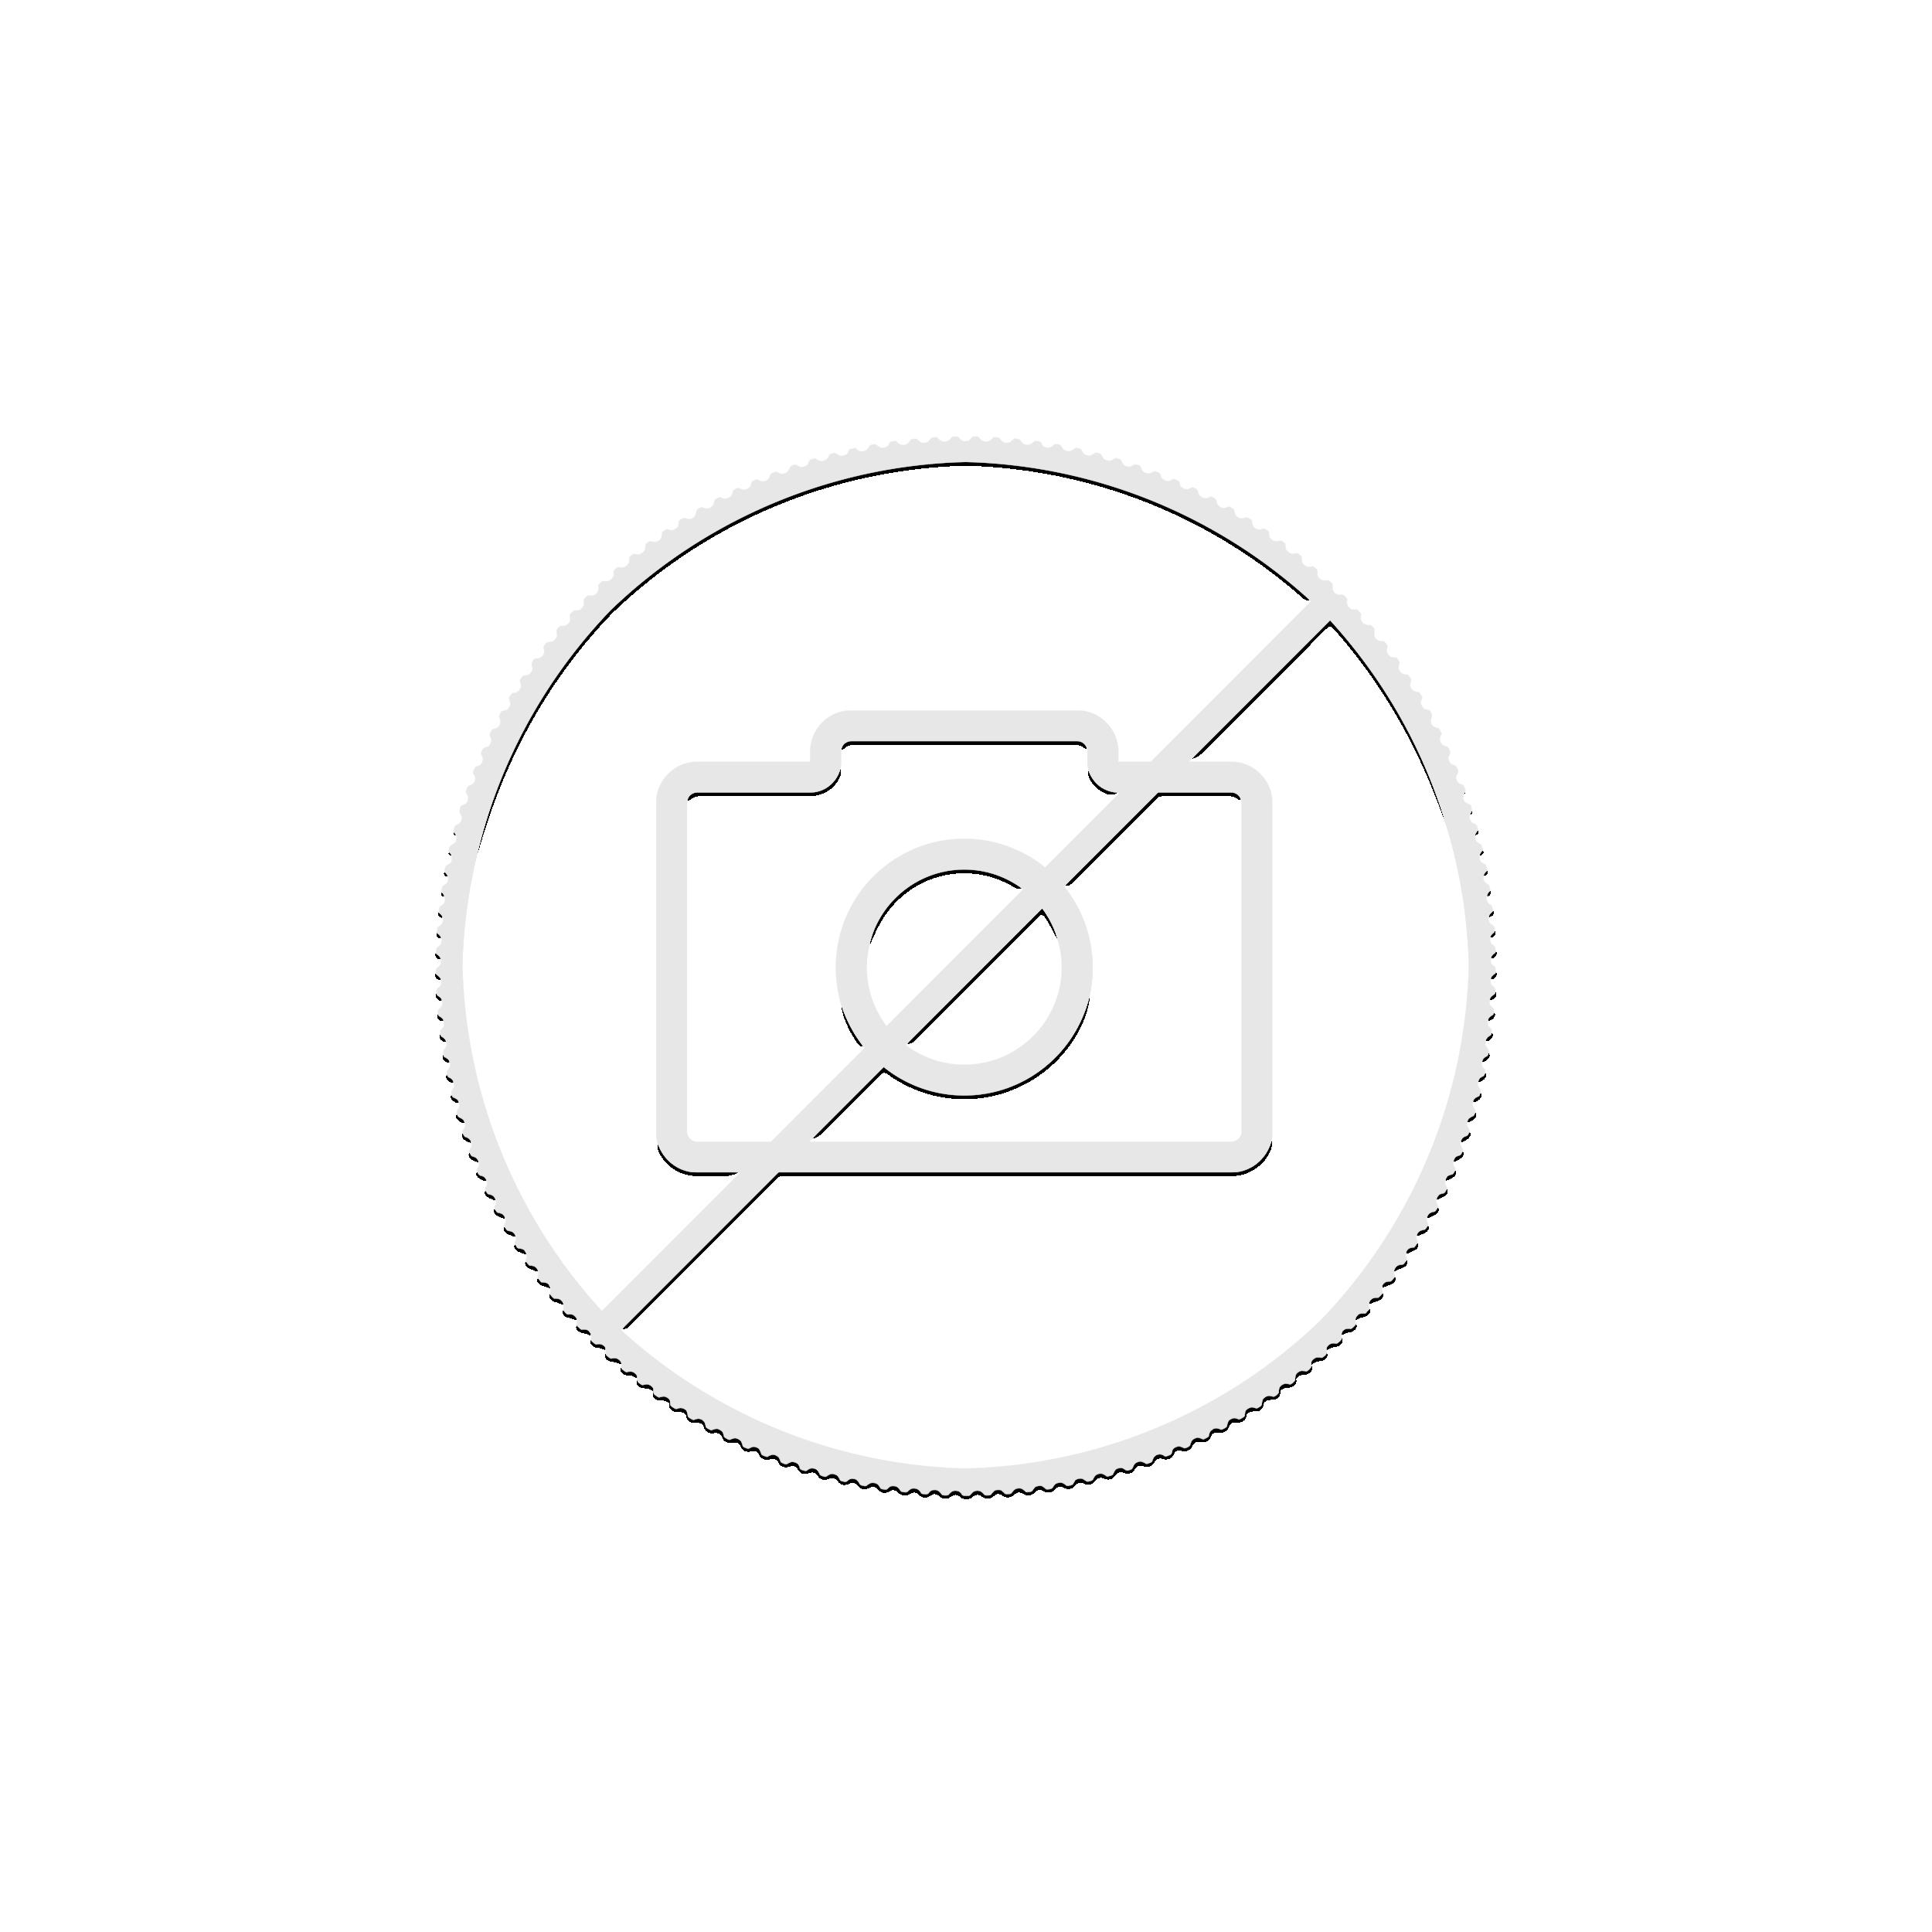 Koala munt 2016 zilver 1 kilo